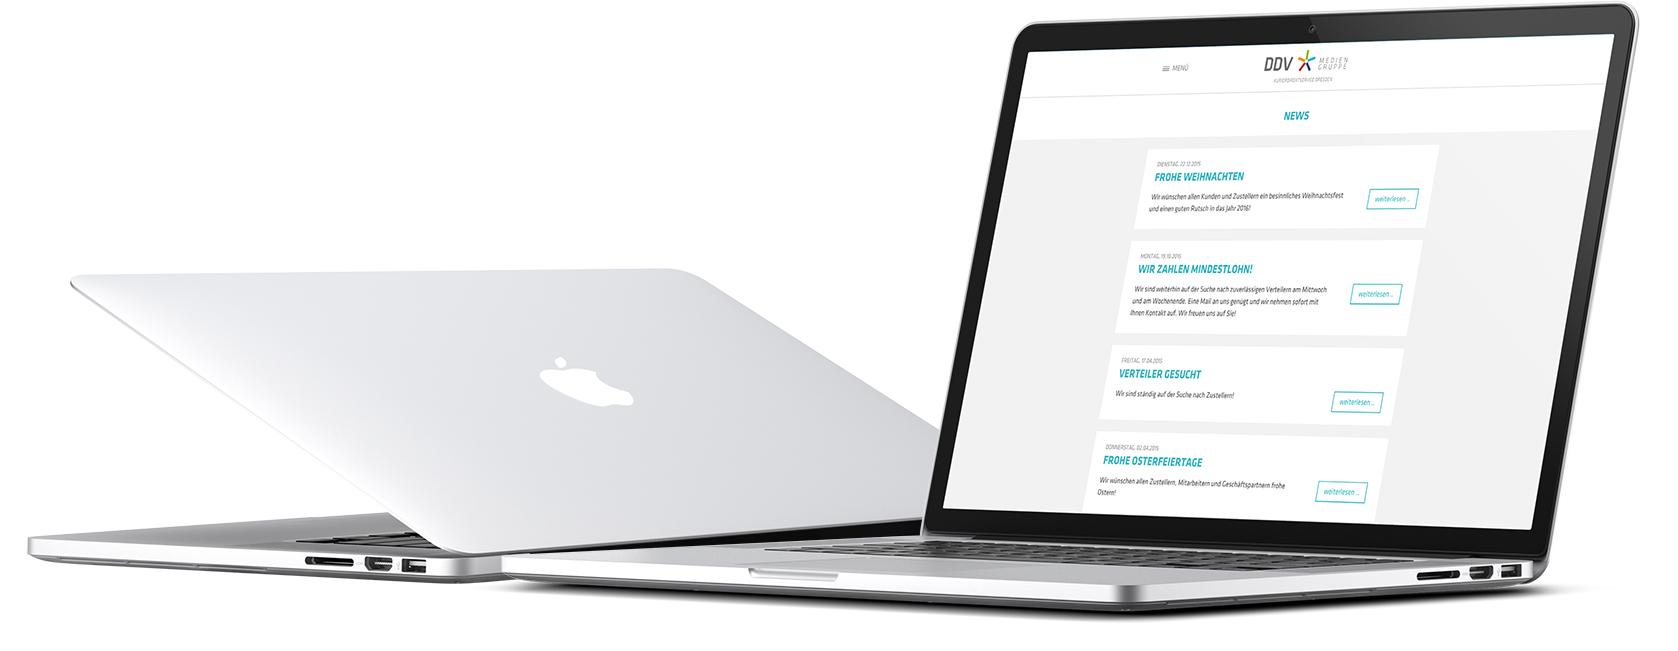 Büro Benedickt - Webdesign